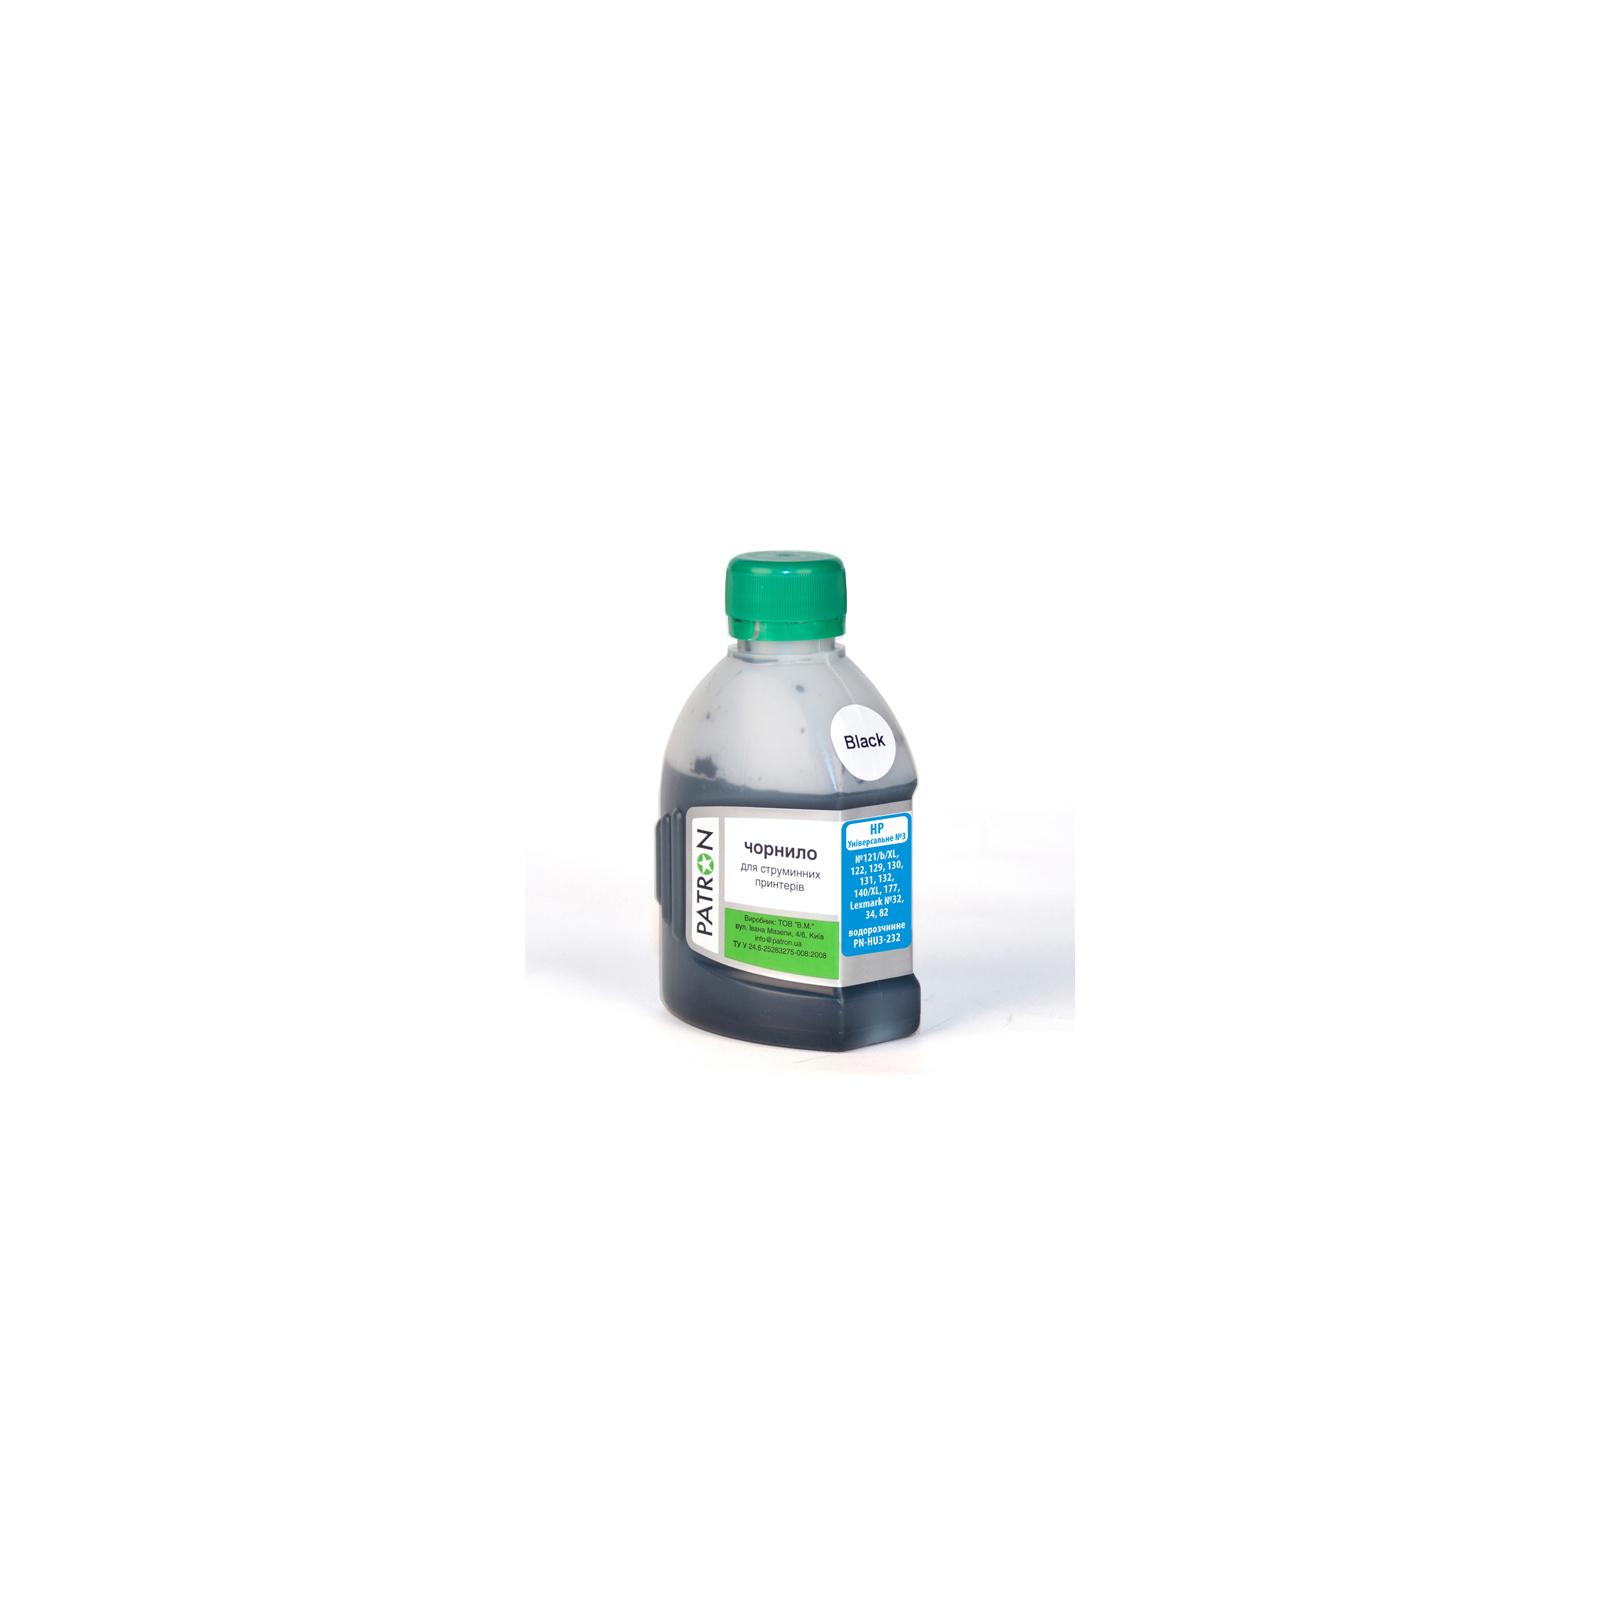 Чернила PATRON HP №130/131 90г BLACKpigment (I-PN-H131-090-B-P)